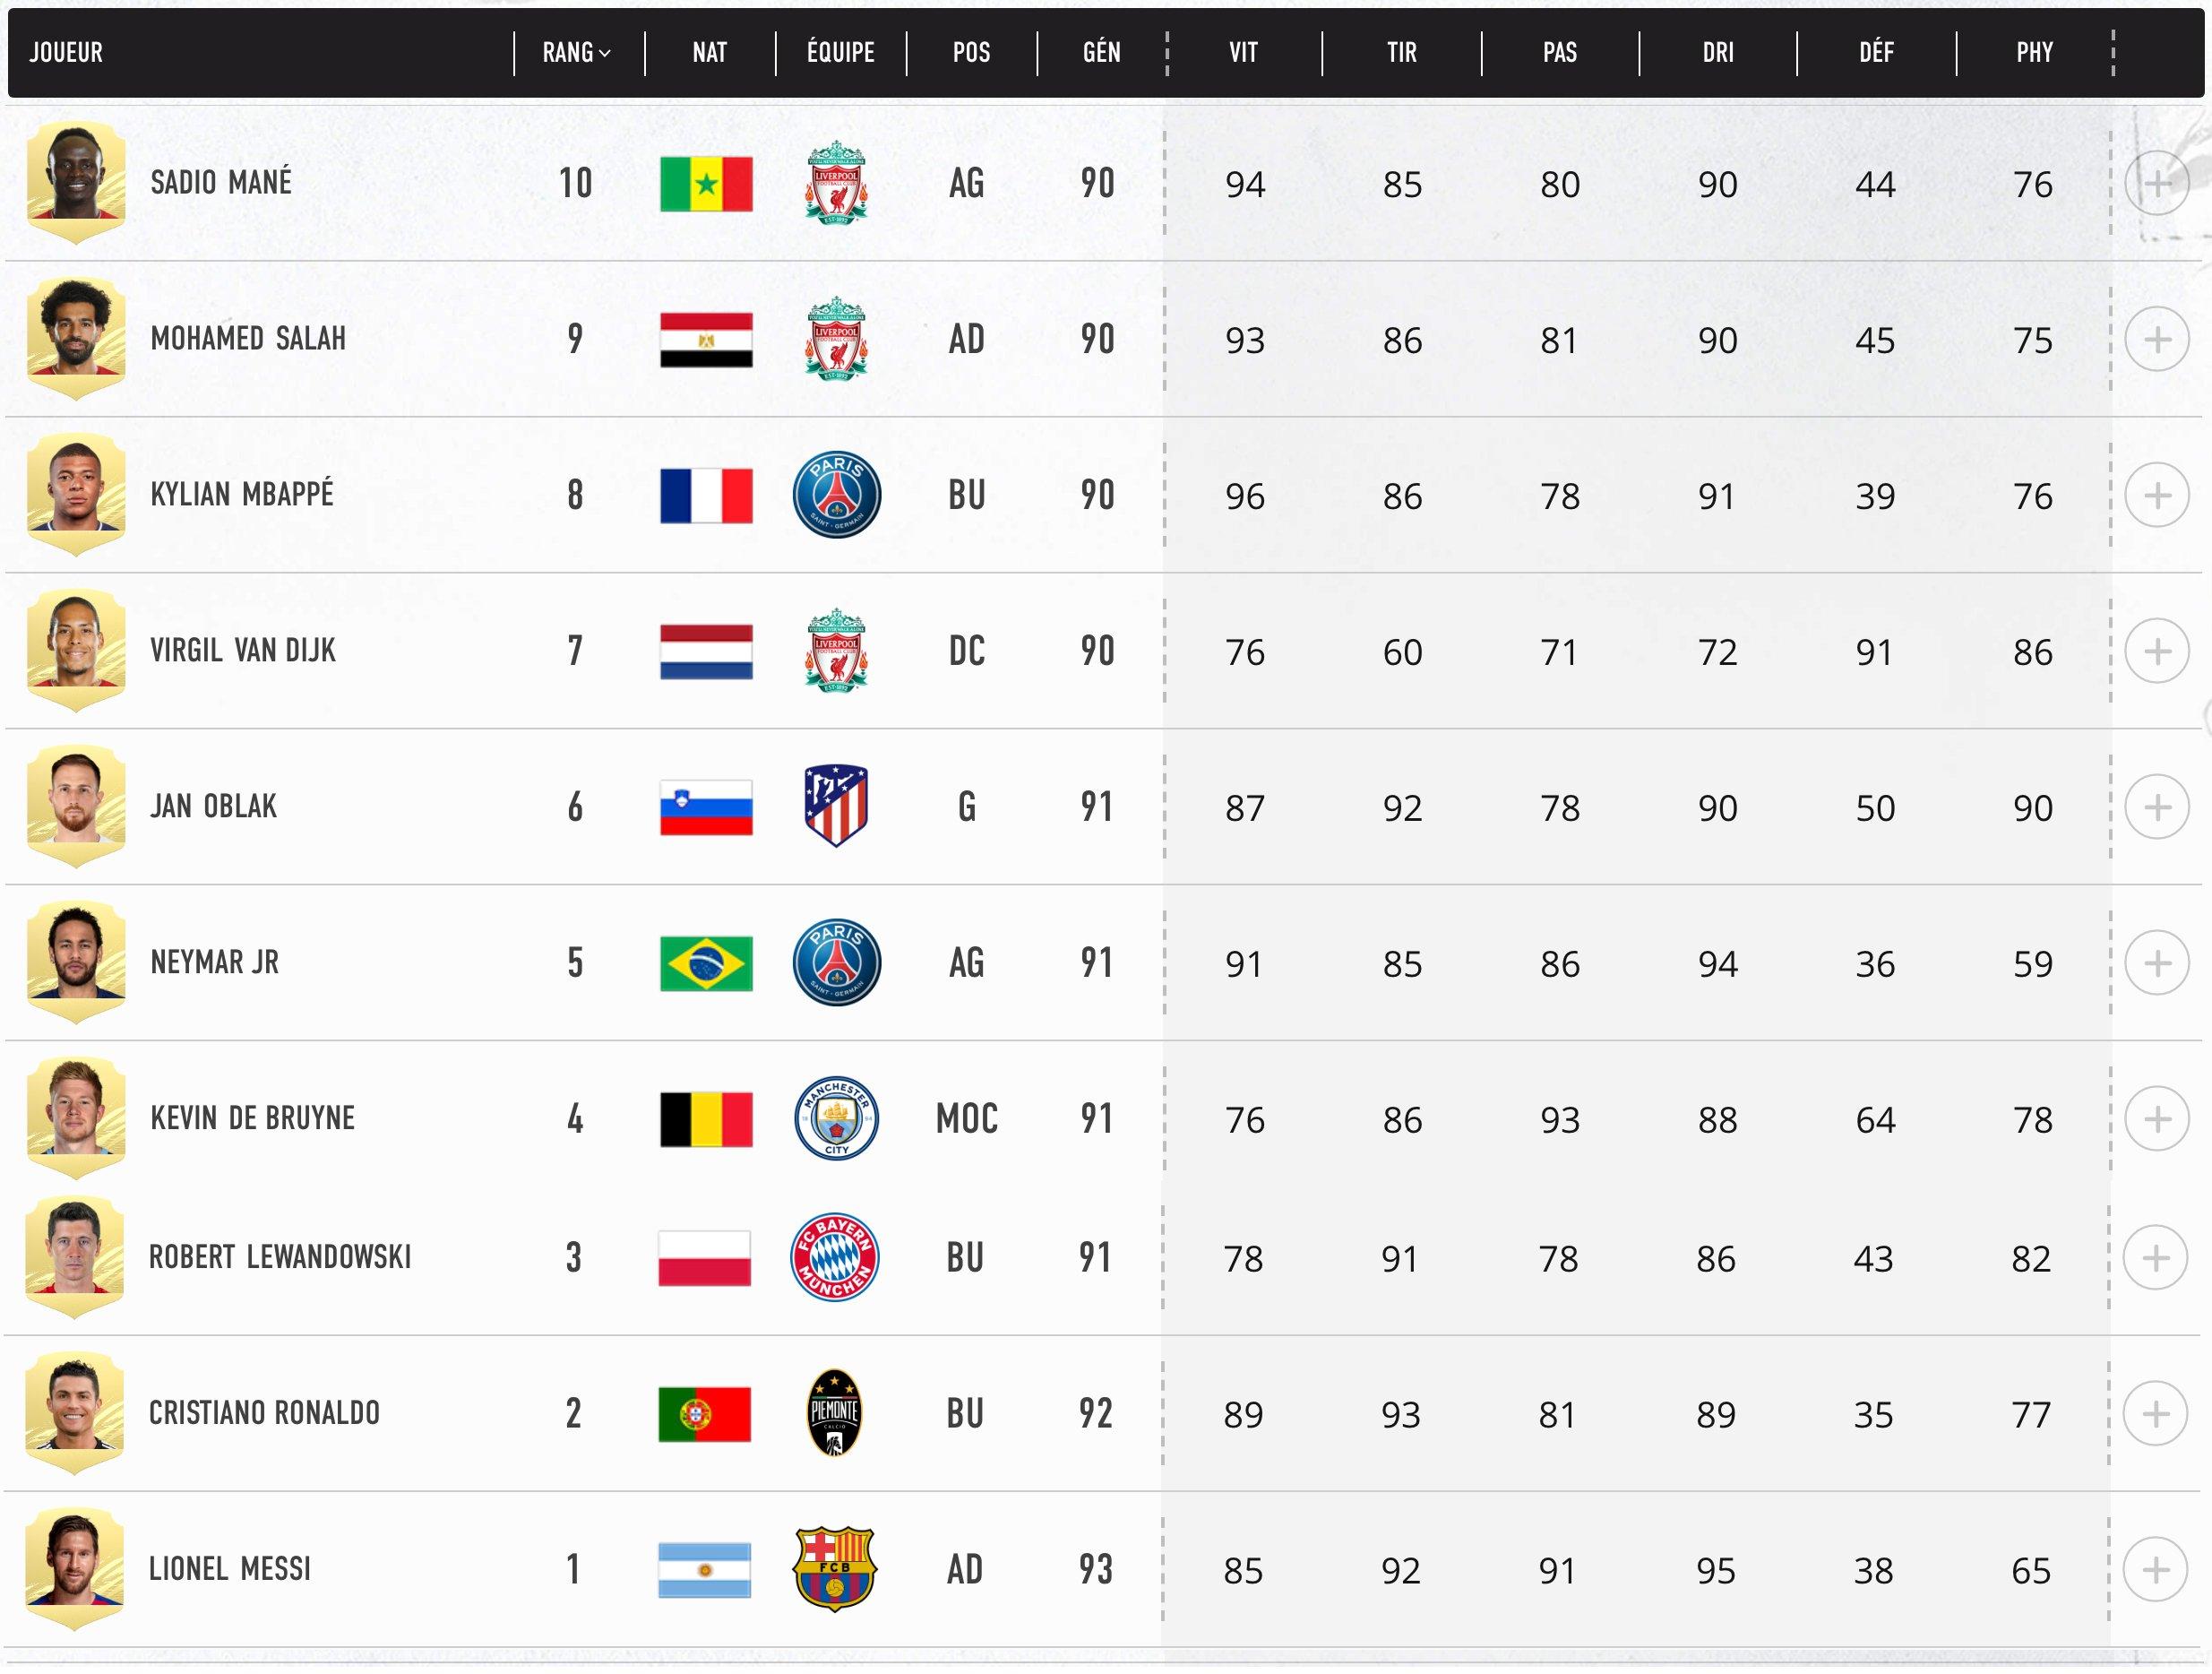 Top 01- 10 Meilleurs Joueurs FIFA 21